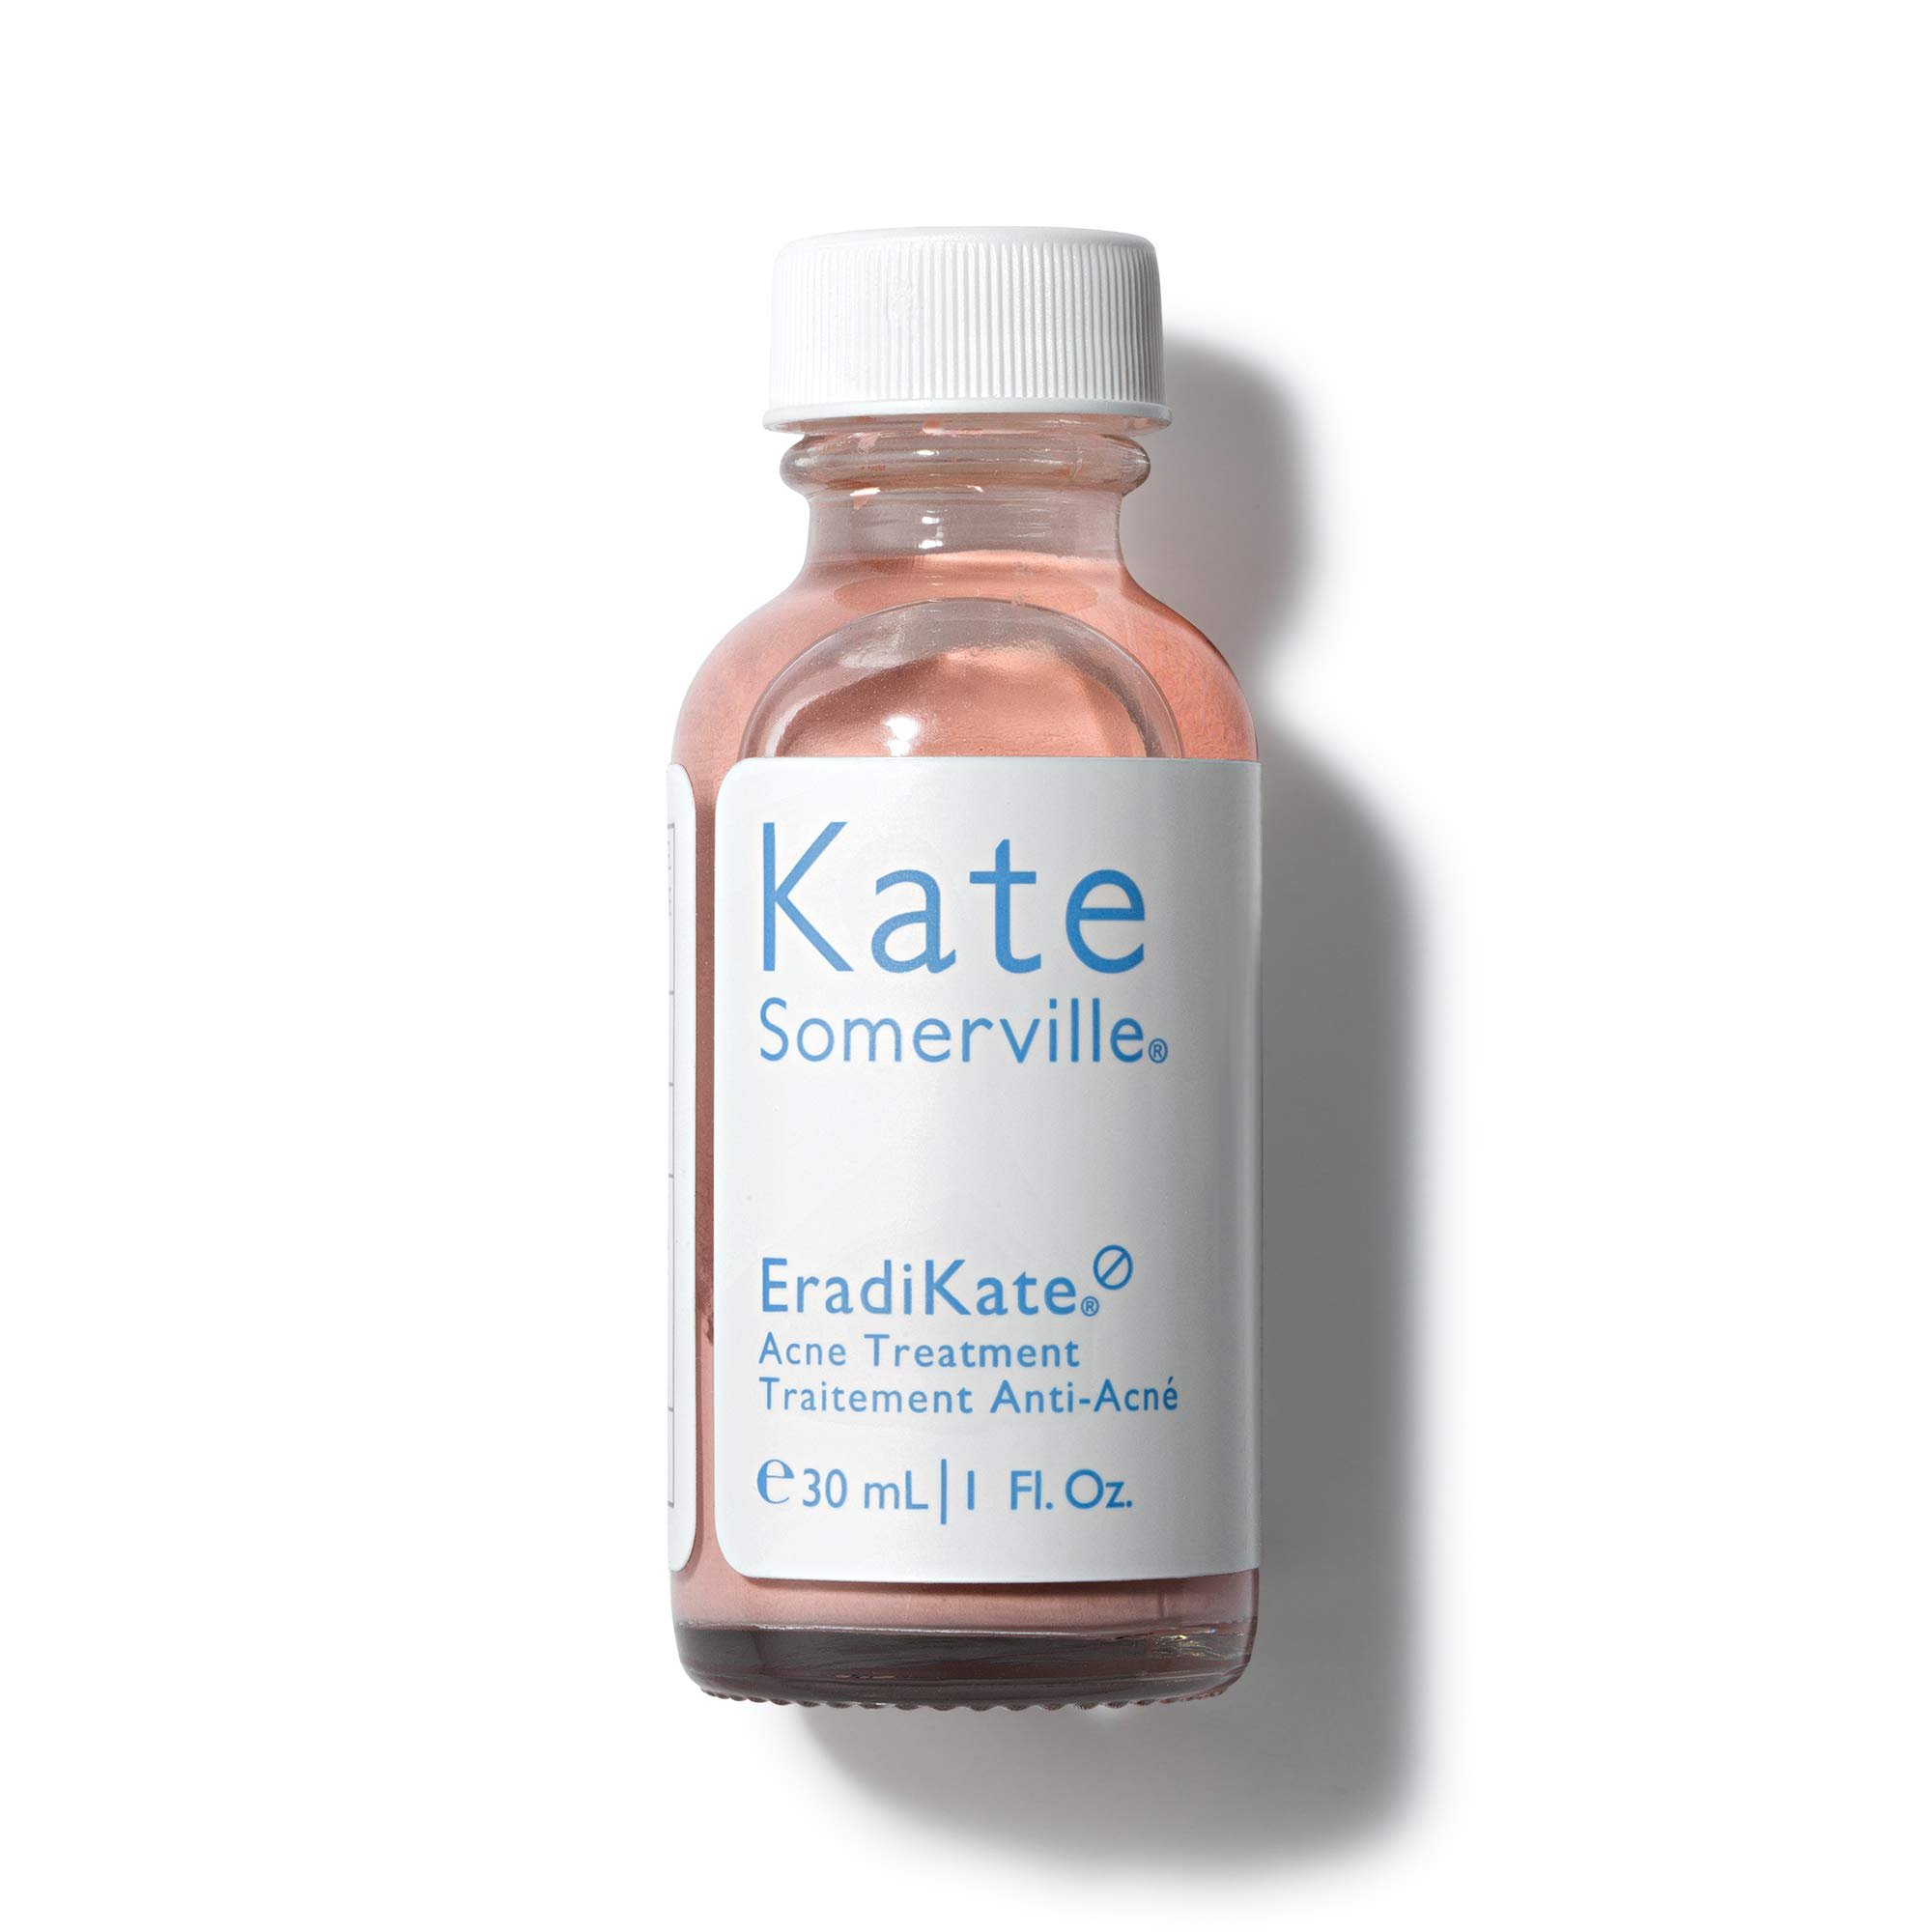 Kate Somerville EradiKate Acne Treatment | Clears Pimples Fast & Prevents Breakouts | Sulfur Spot Treatment | 1 Fl Oz